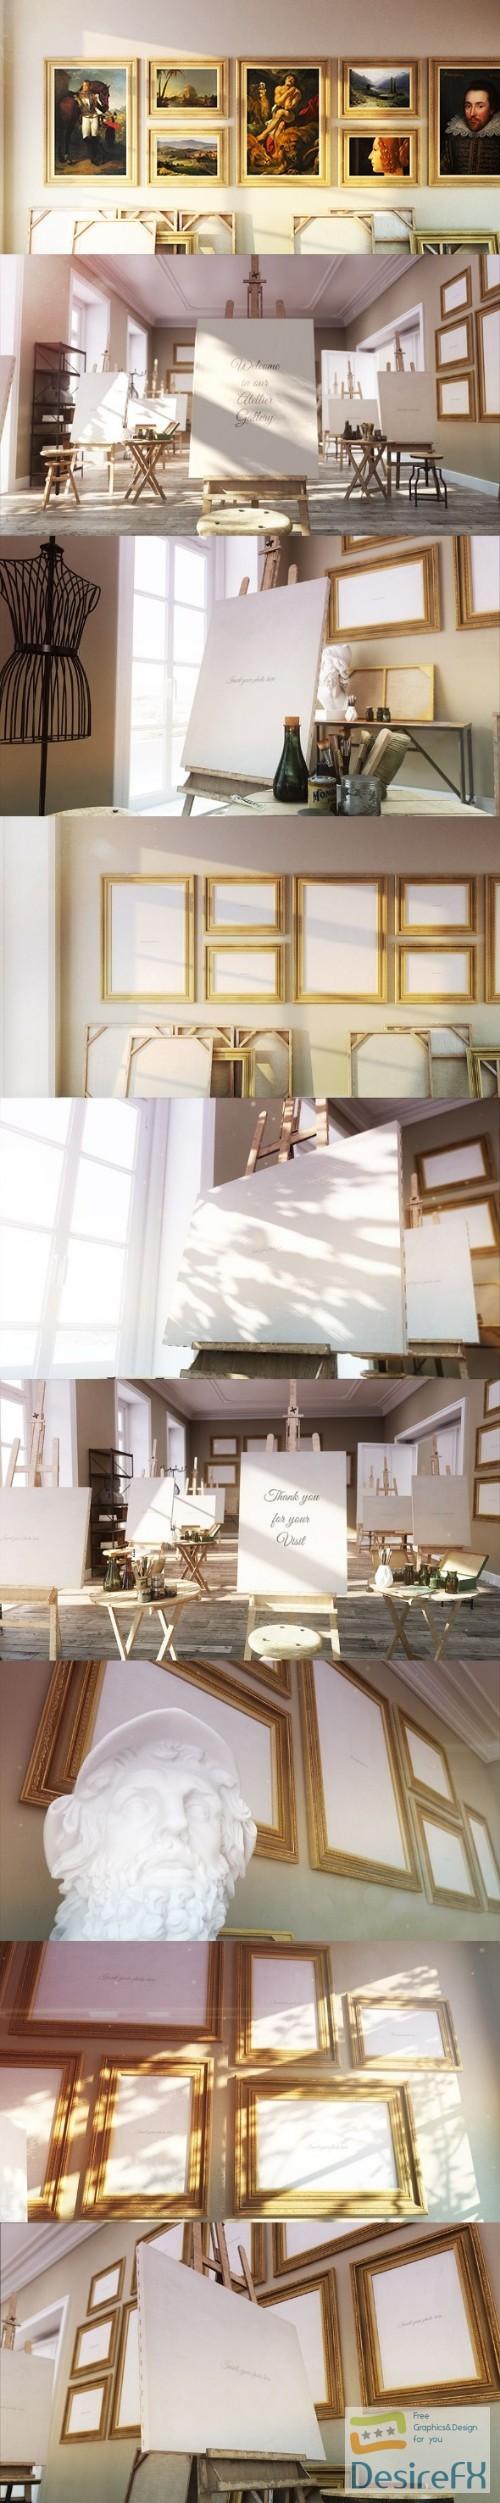 Videohive Atelier Photo Gallery 18649902